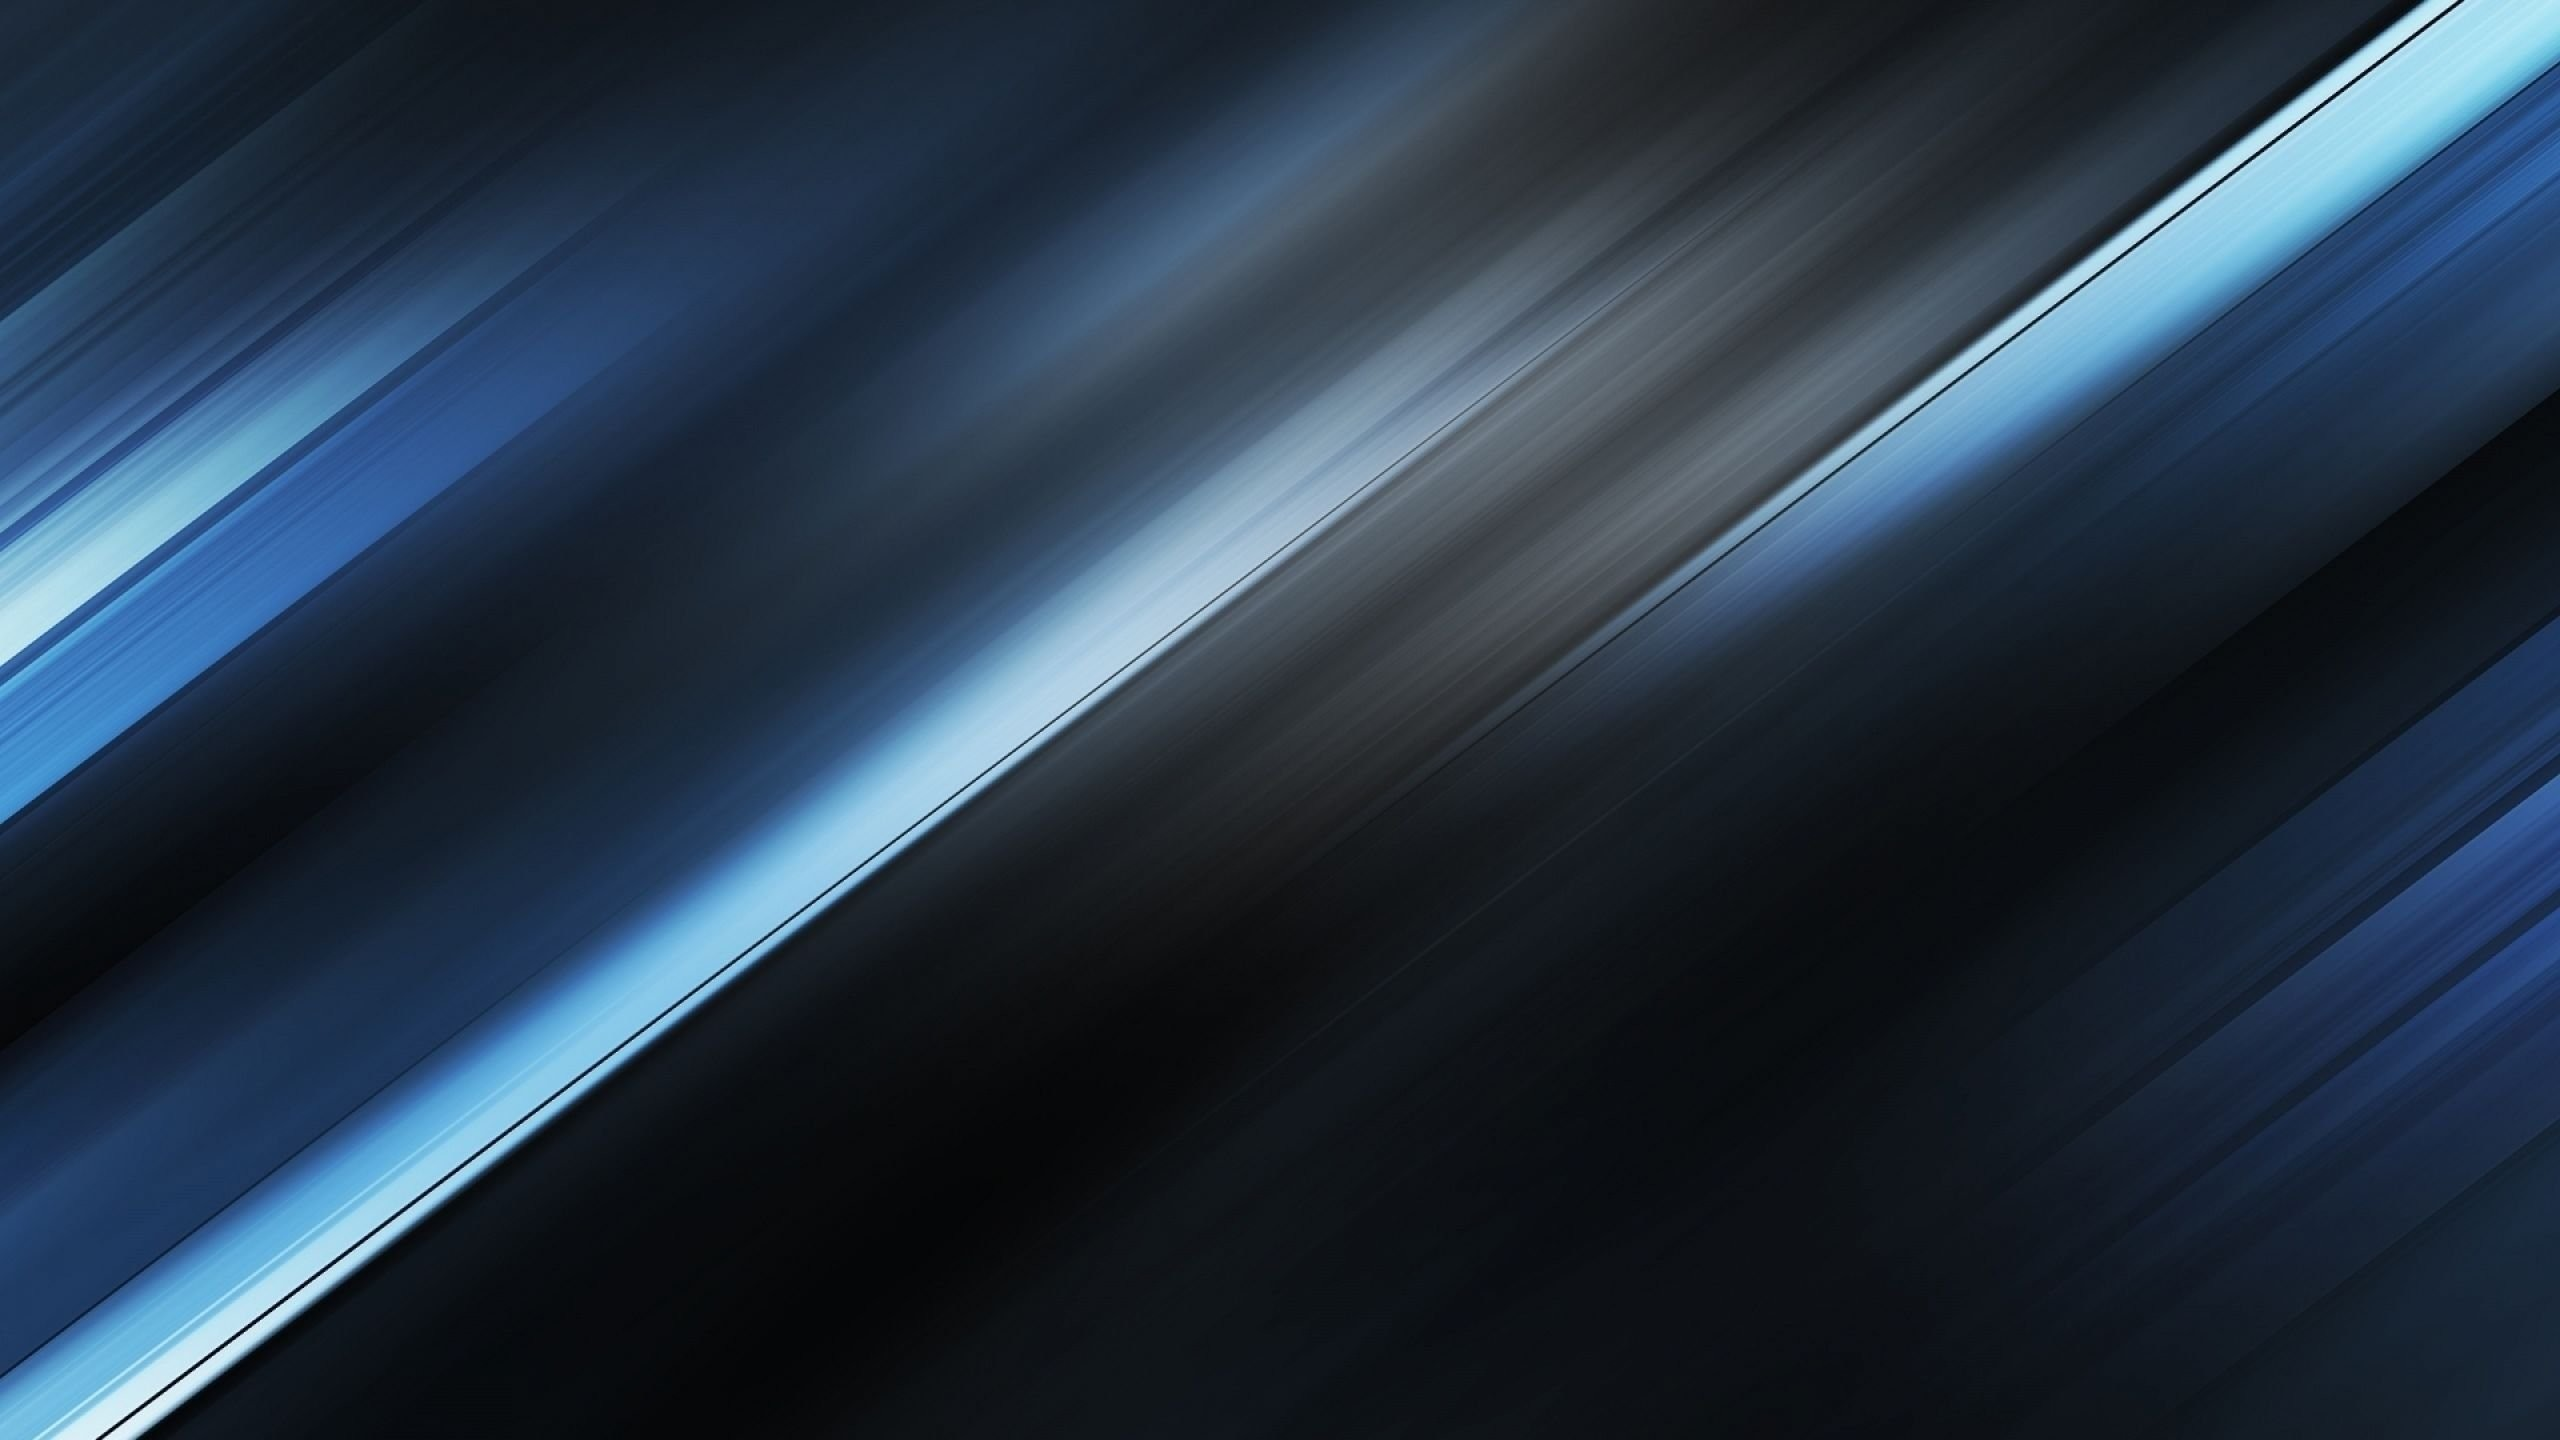 Blue Metallic Background Wallpaper